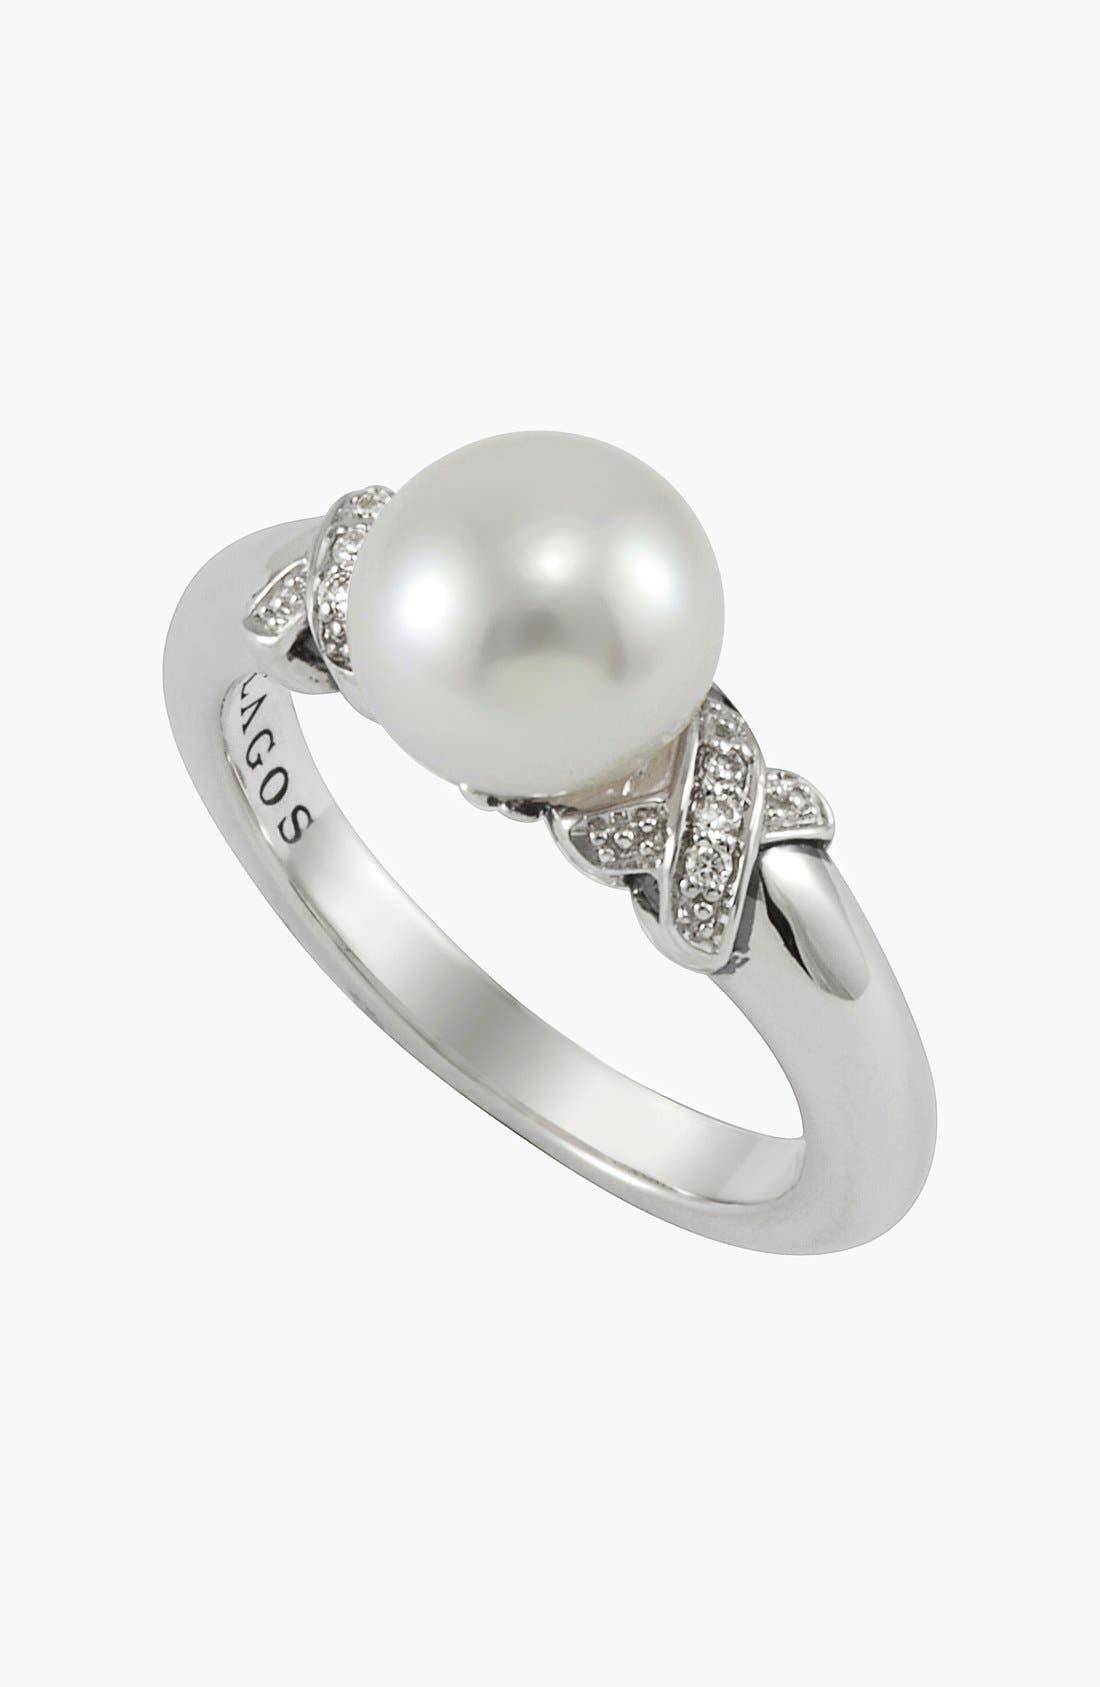 Main Image - Lagos 'Luna' Diamond & Pearl Ring